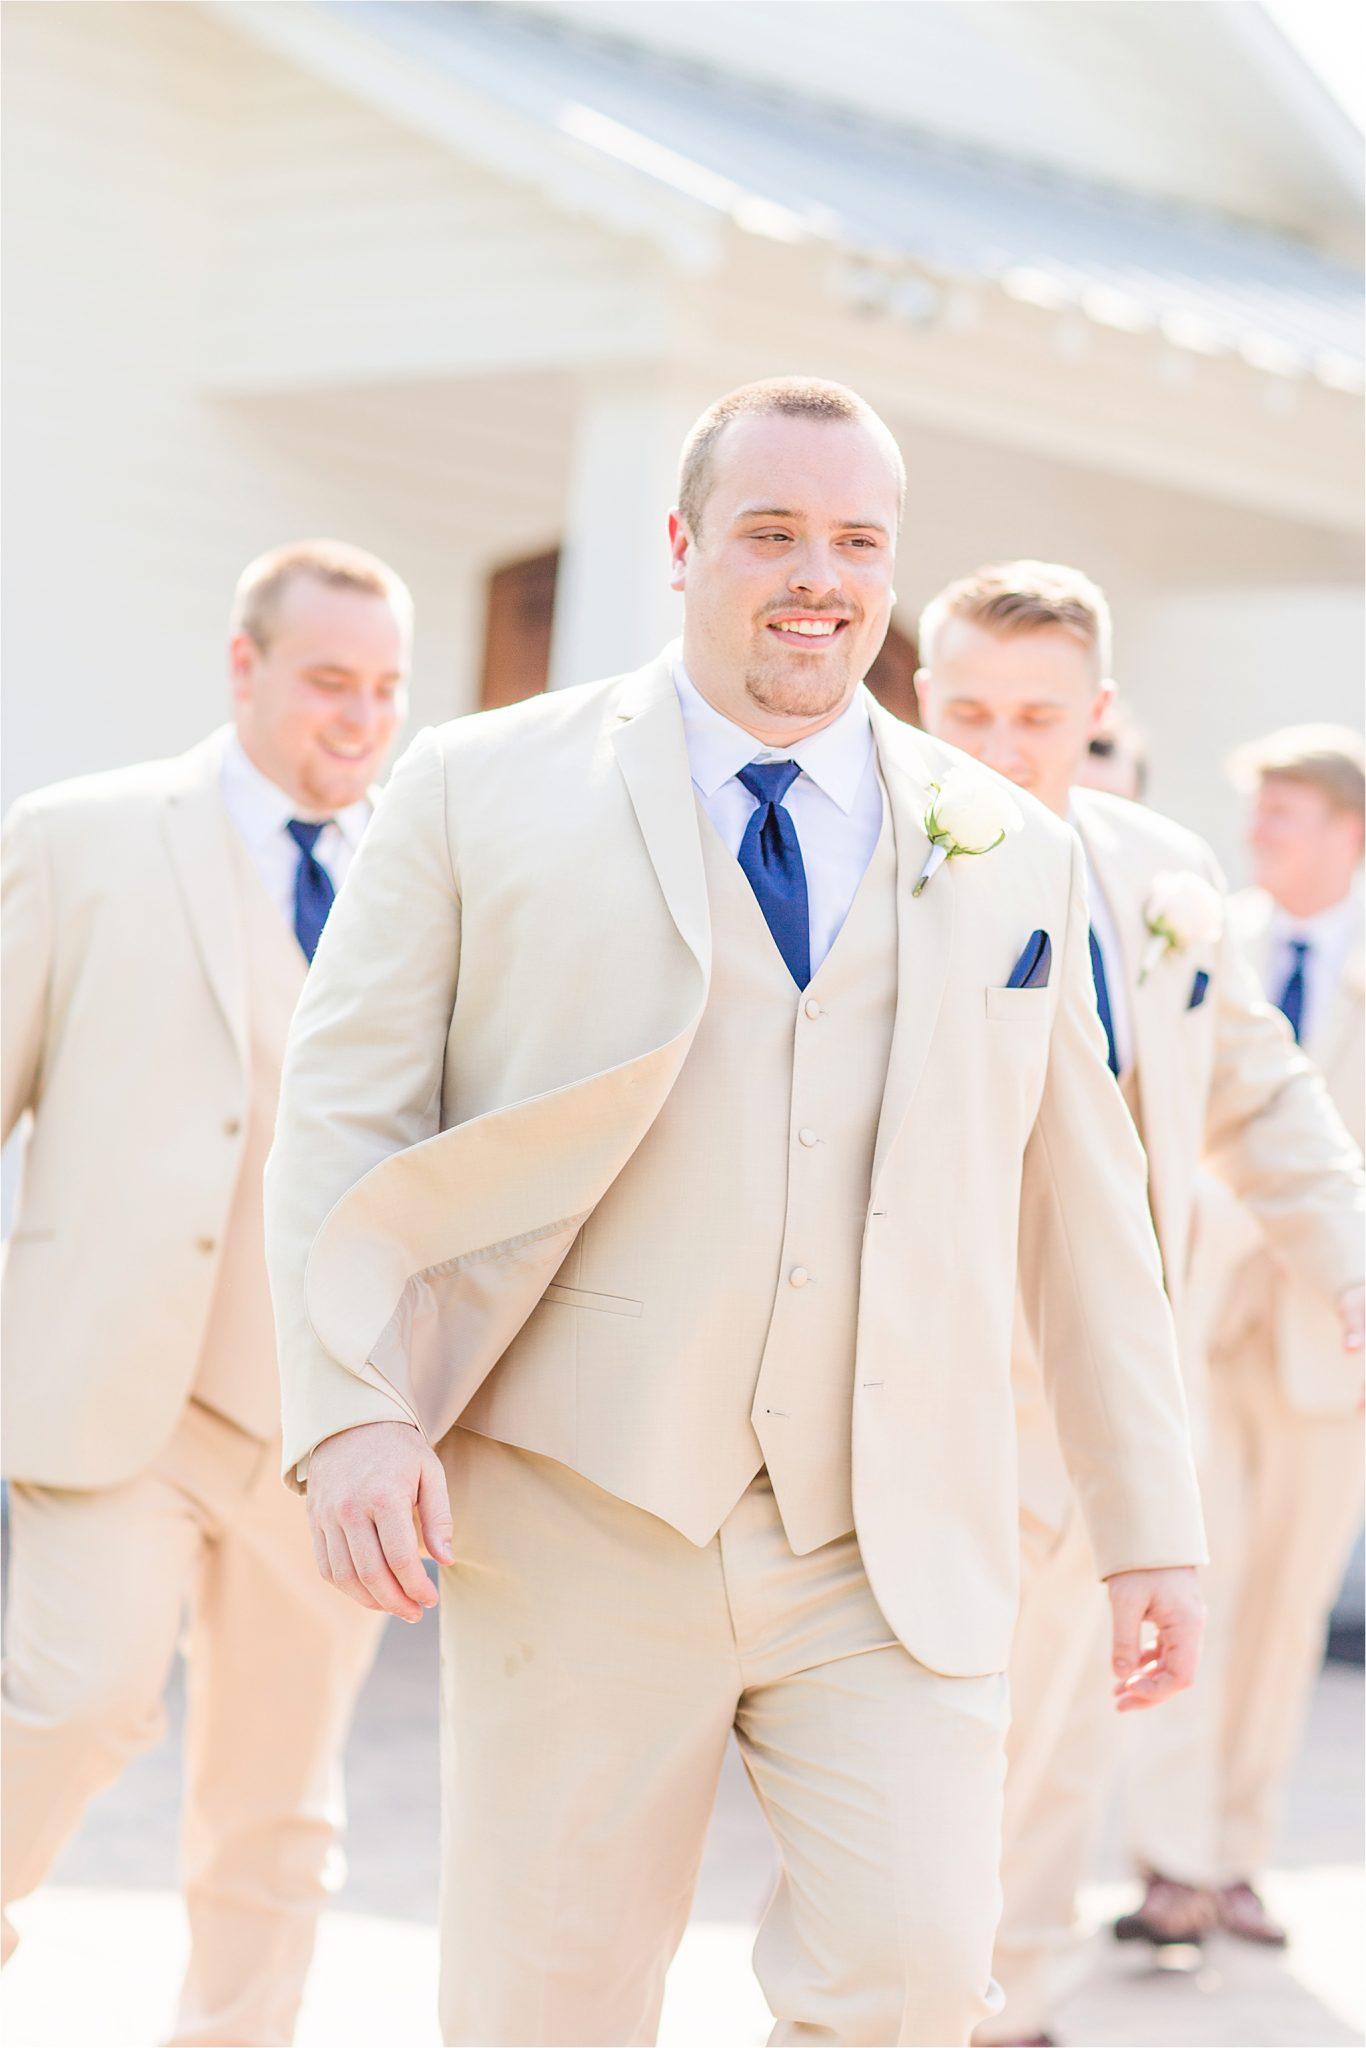 Sonnet House, Birmingham Alabama Wedding Photographer, Grooms and groomsmen